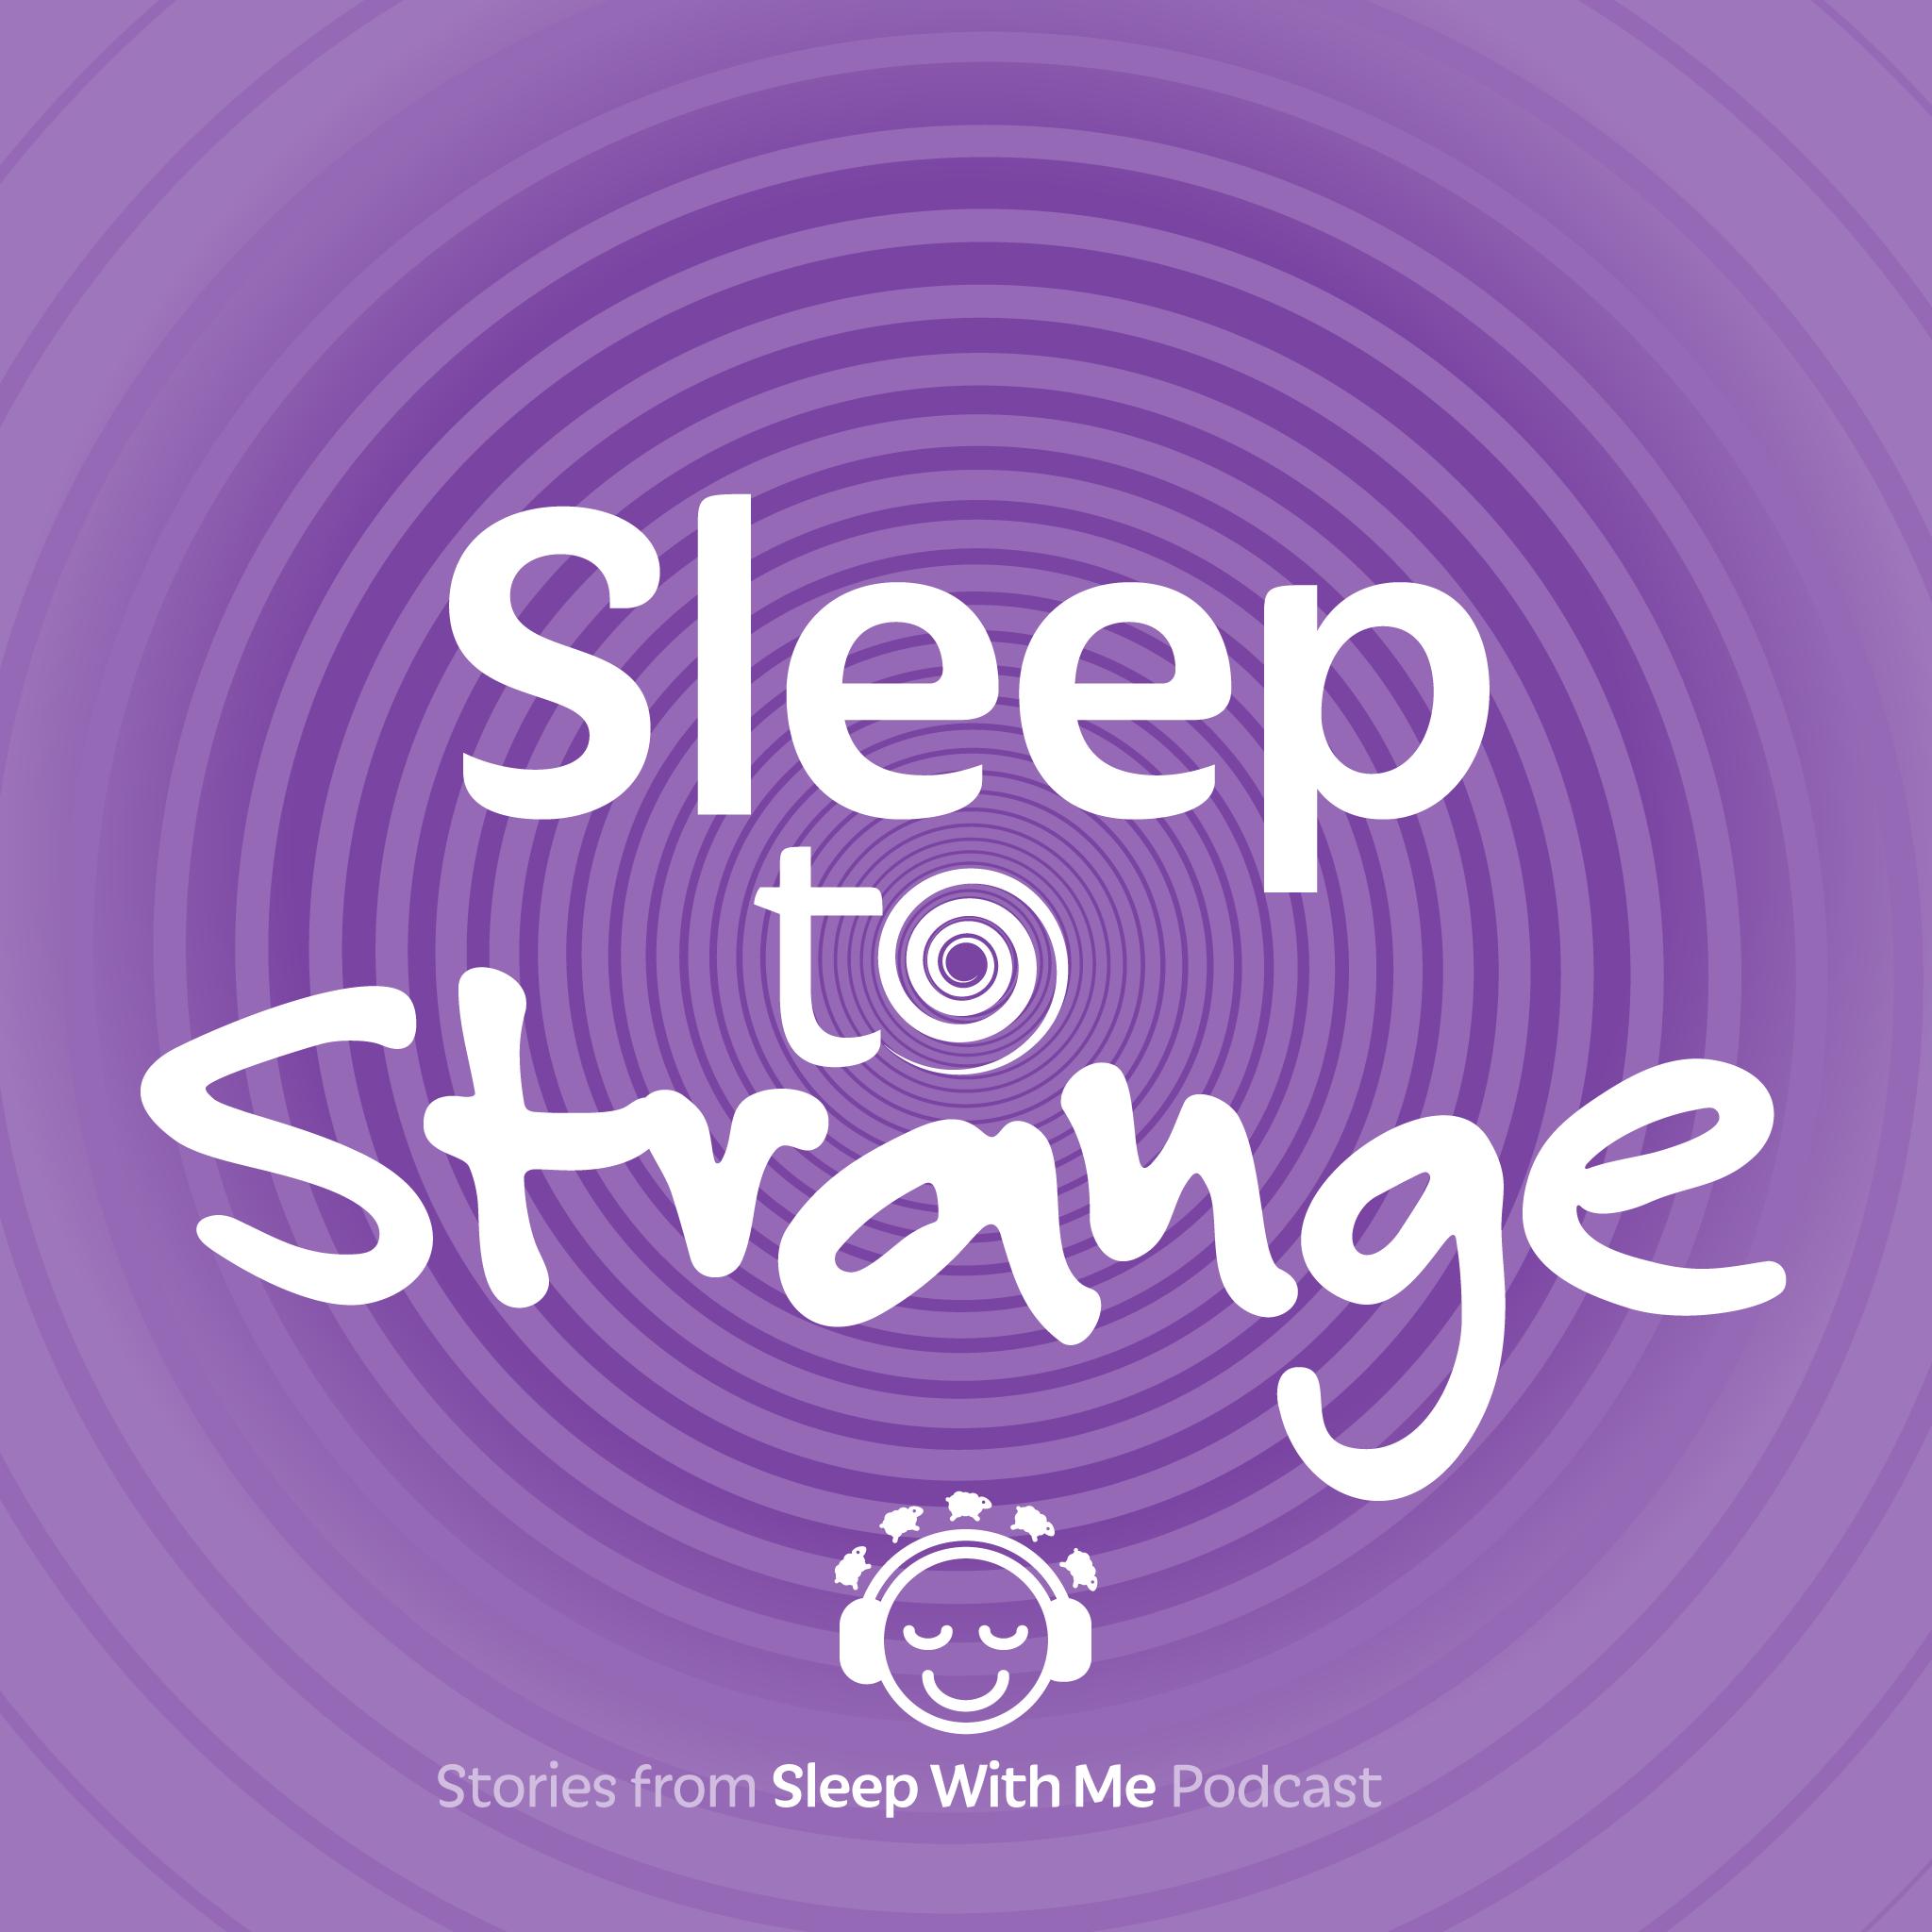 Sleep to Strange show art